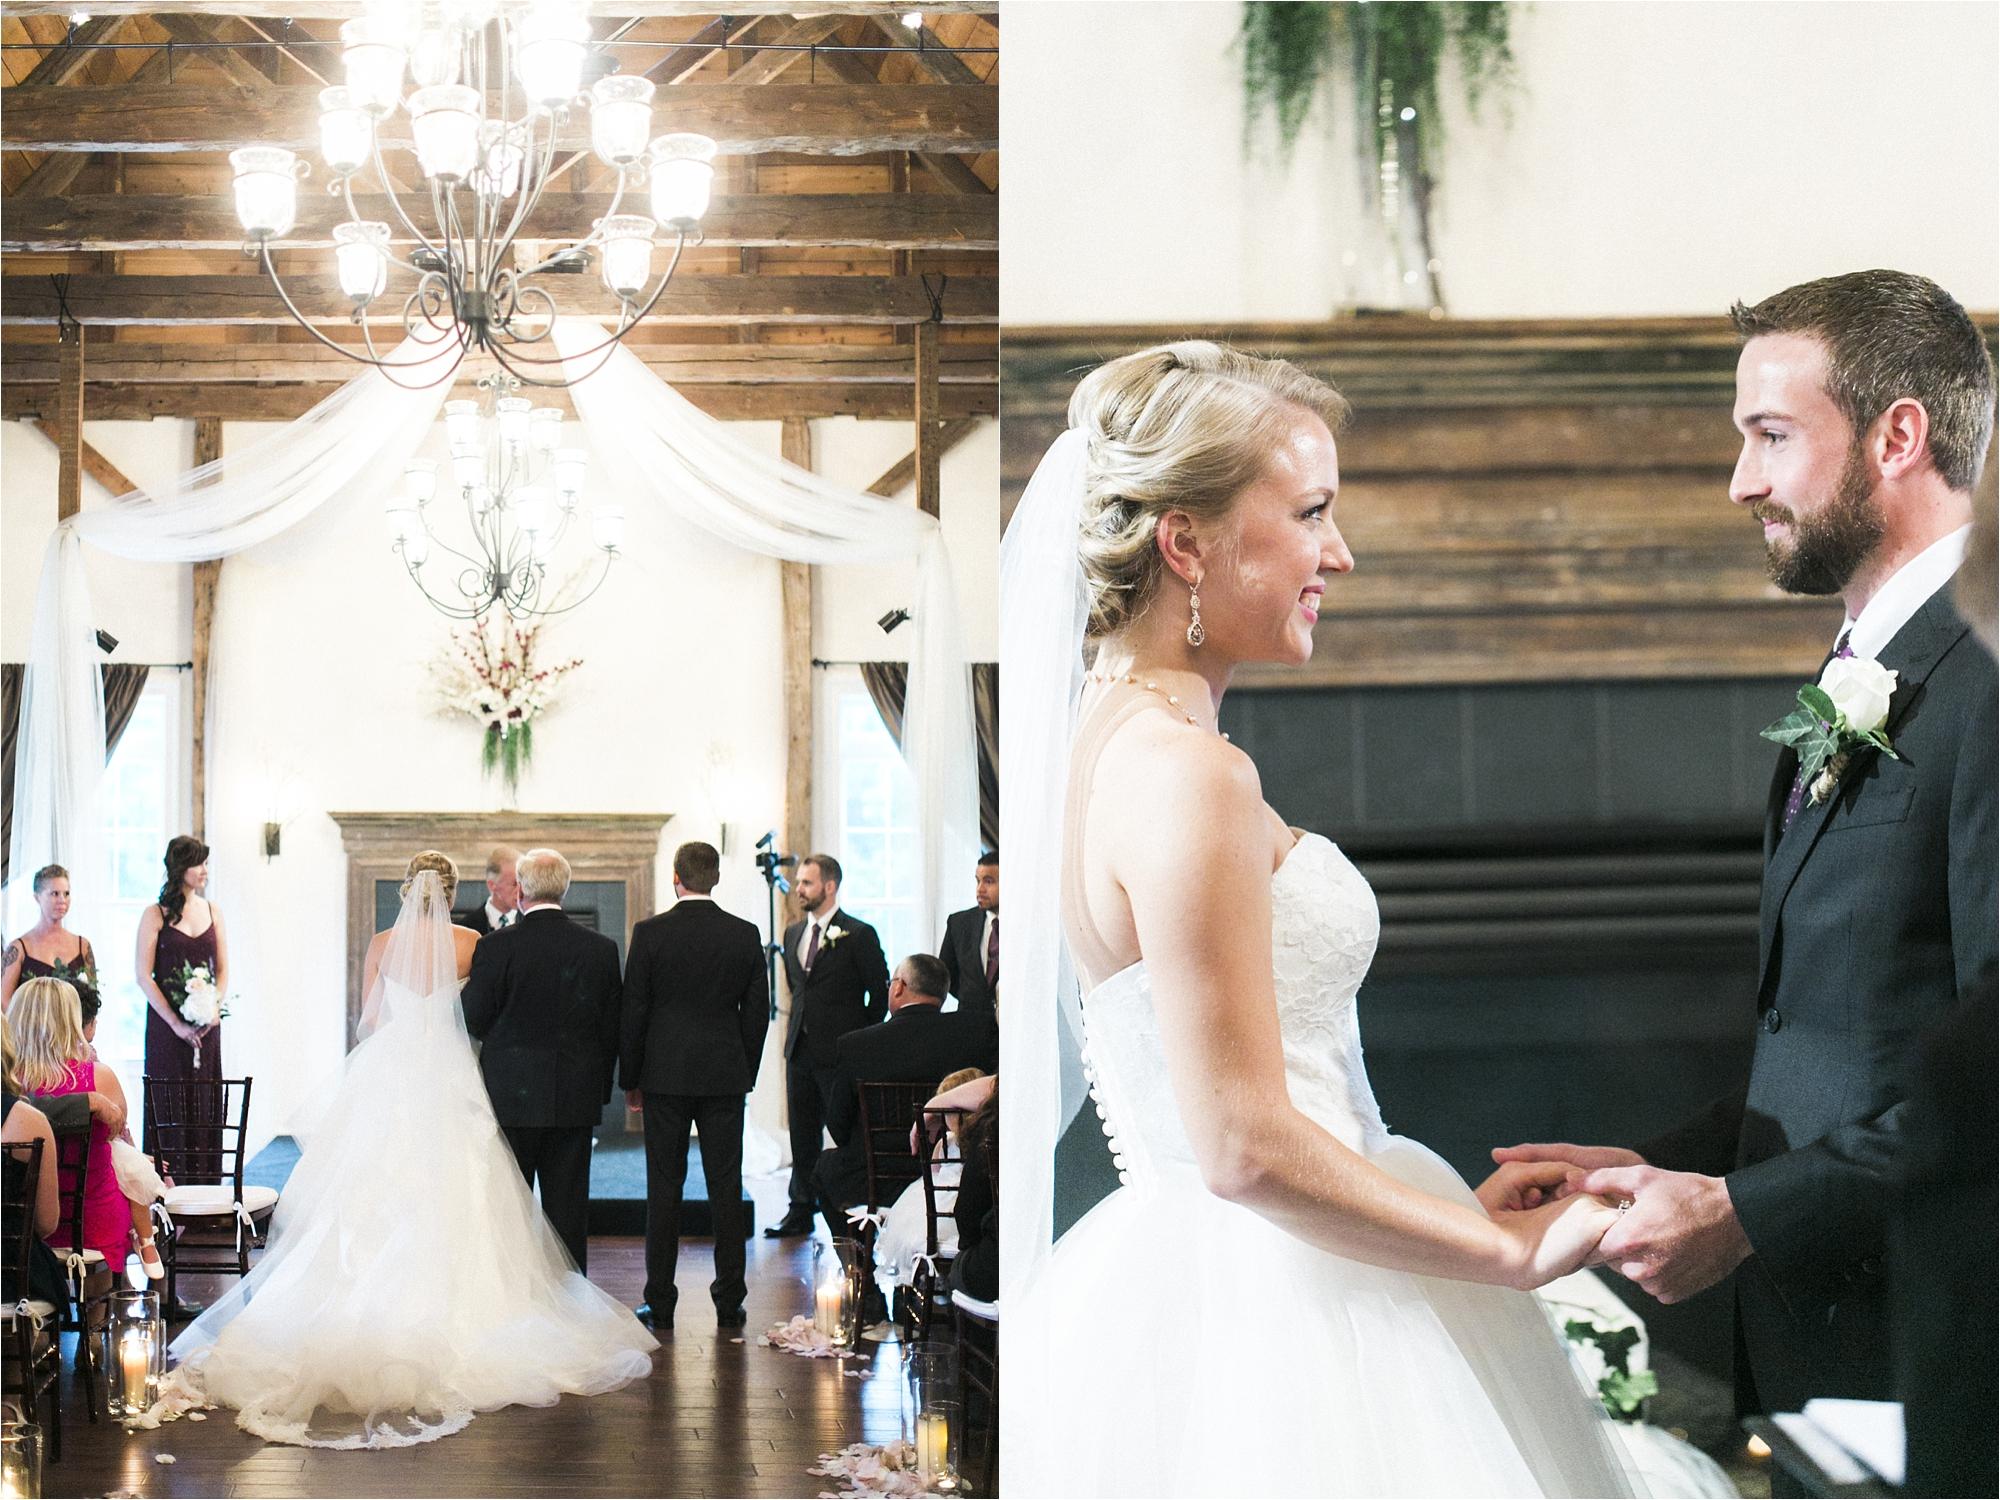 fredericksburg-virginia-stevenson-ridge-wedding-stephanie-yonce-photo_0027.jpg